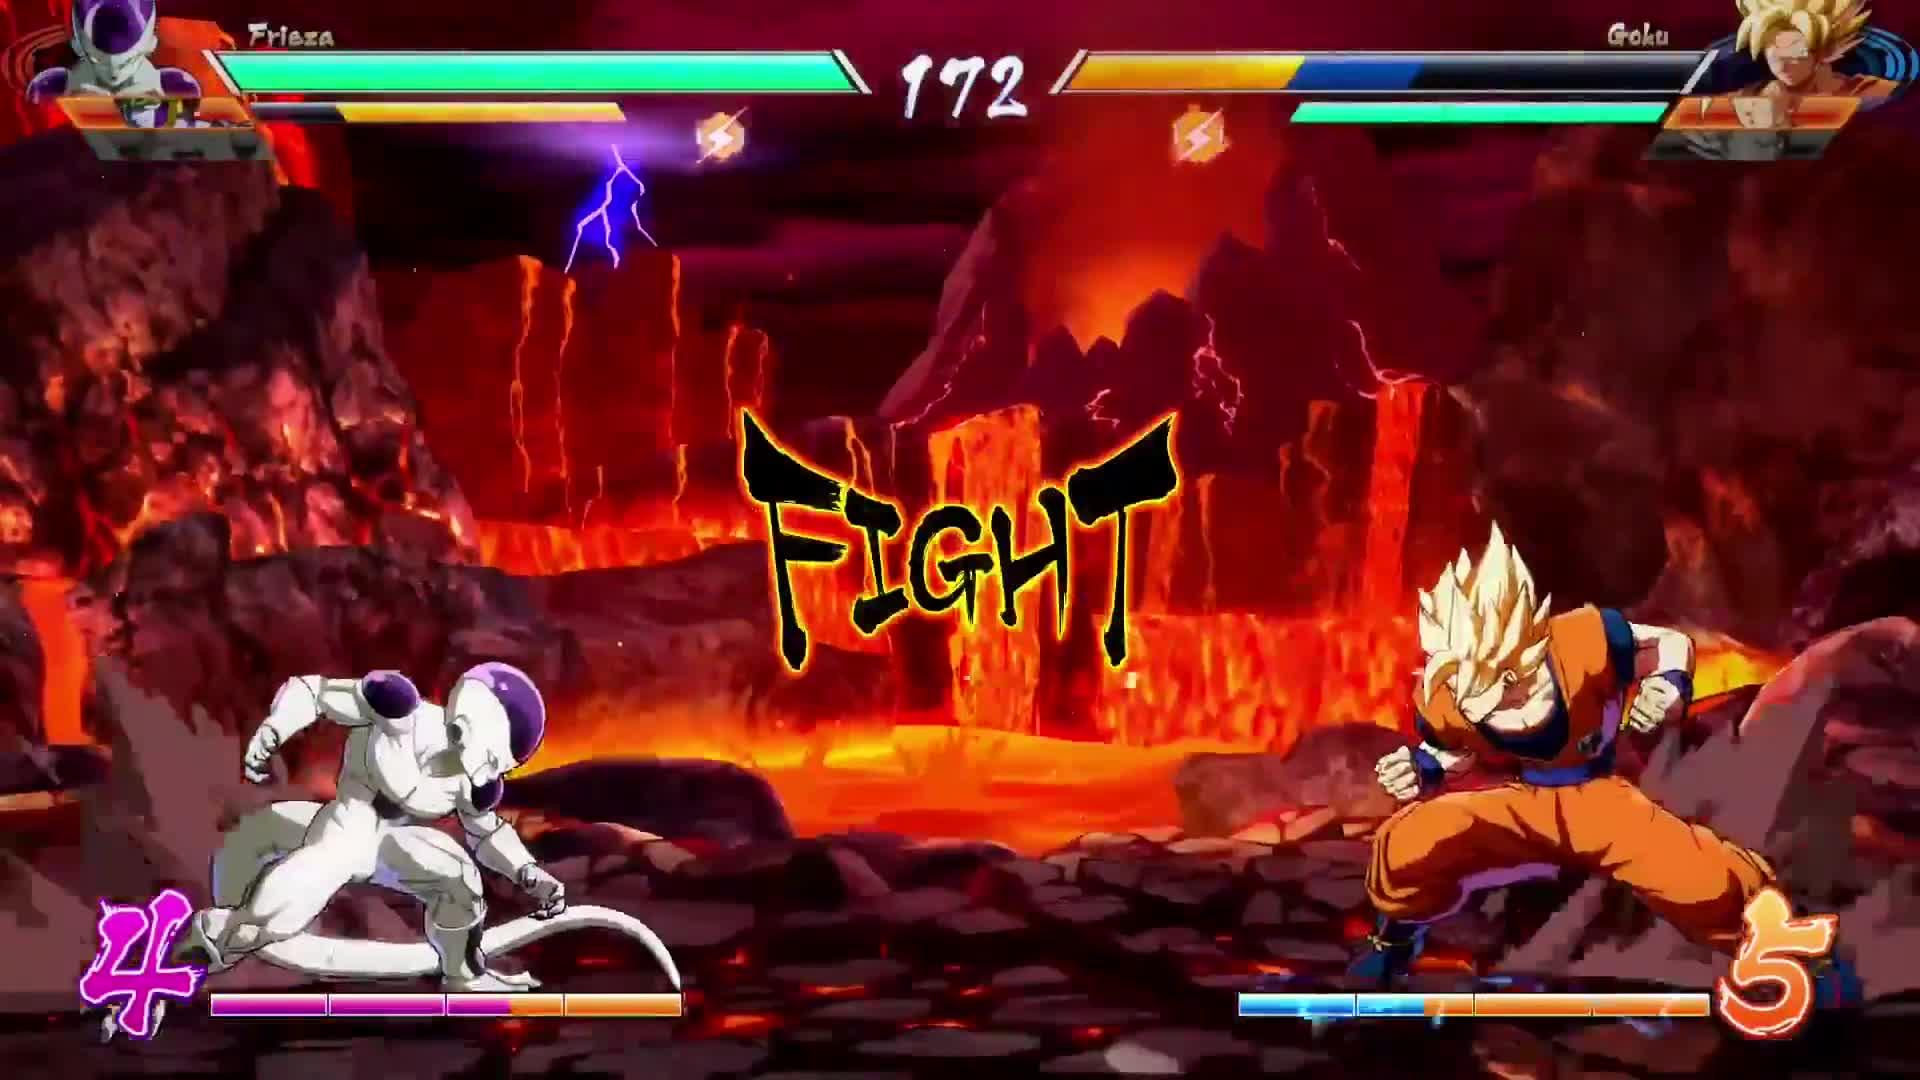 Dragon Ball FighterZ - Gameplay screen capture